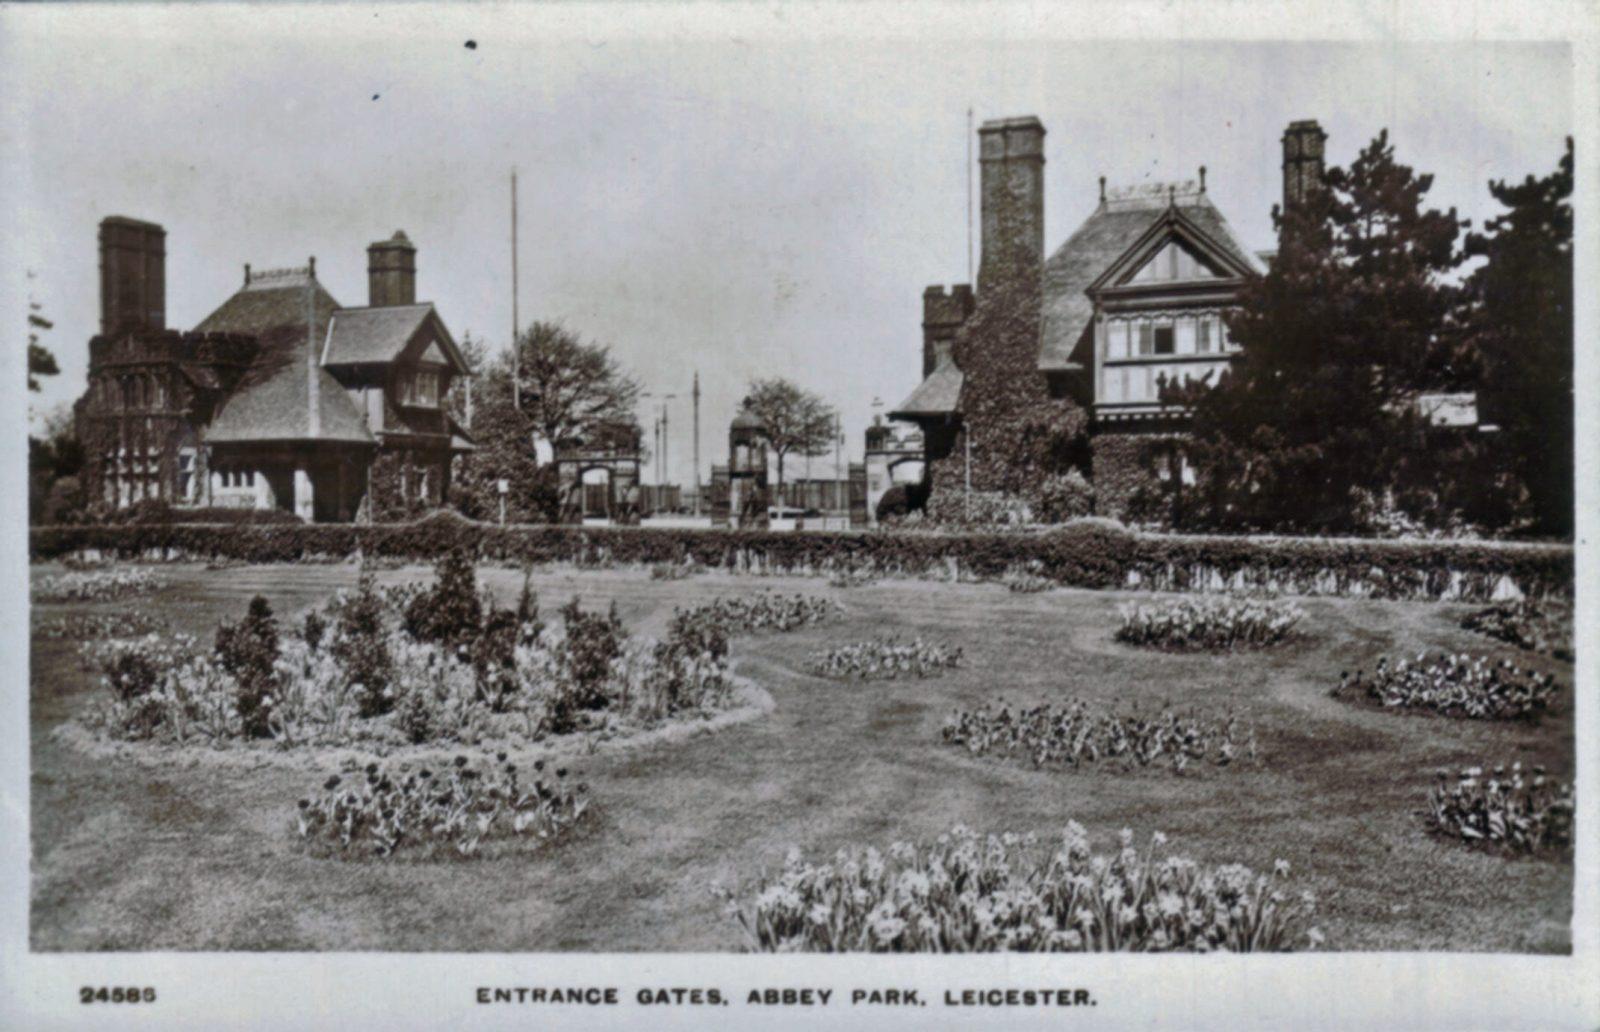 Abbey Park, Leicester. 1901-1920: Main Entrance gates. (File:1205)